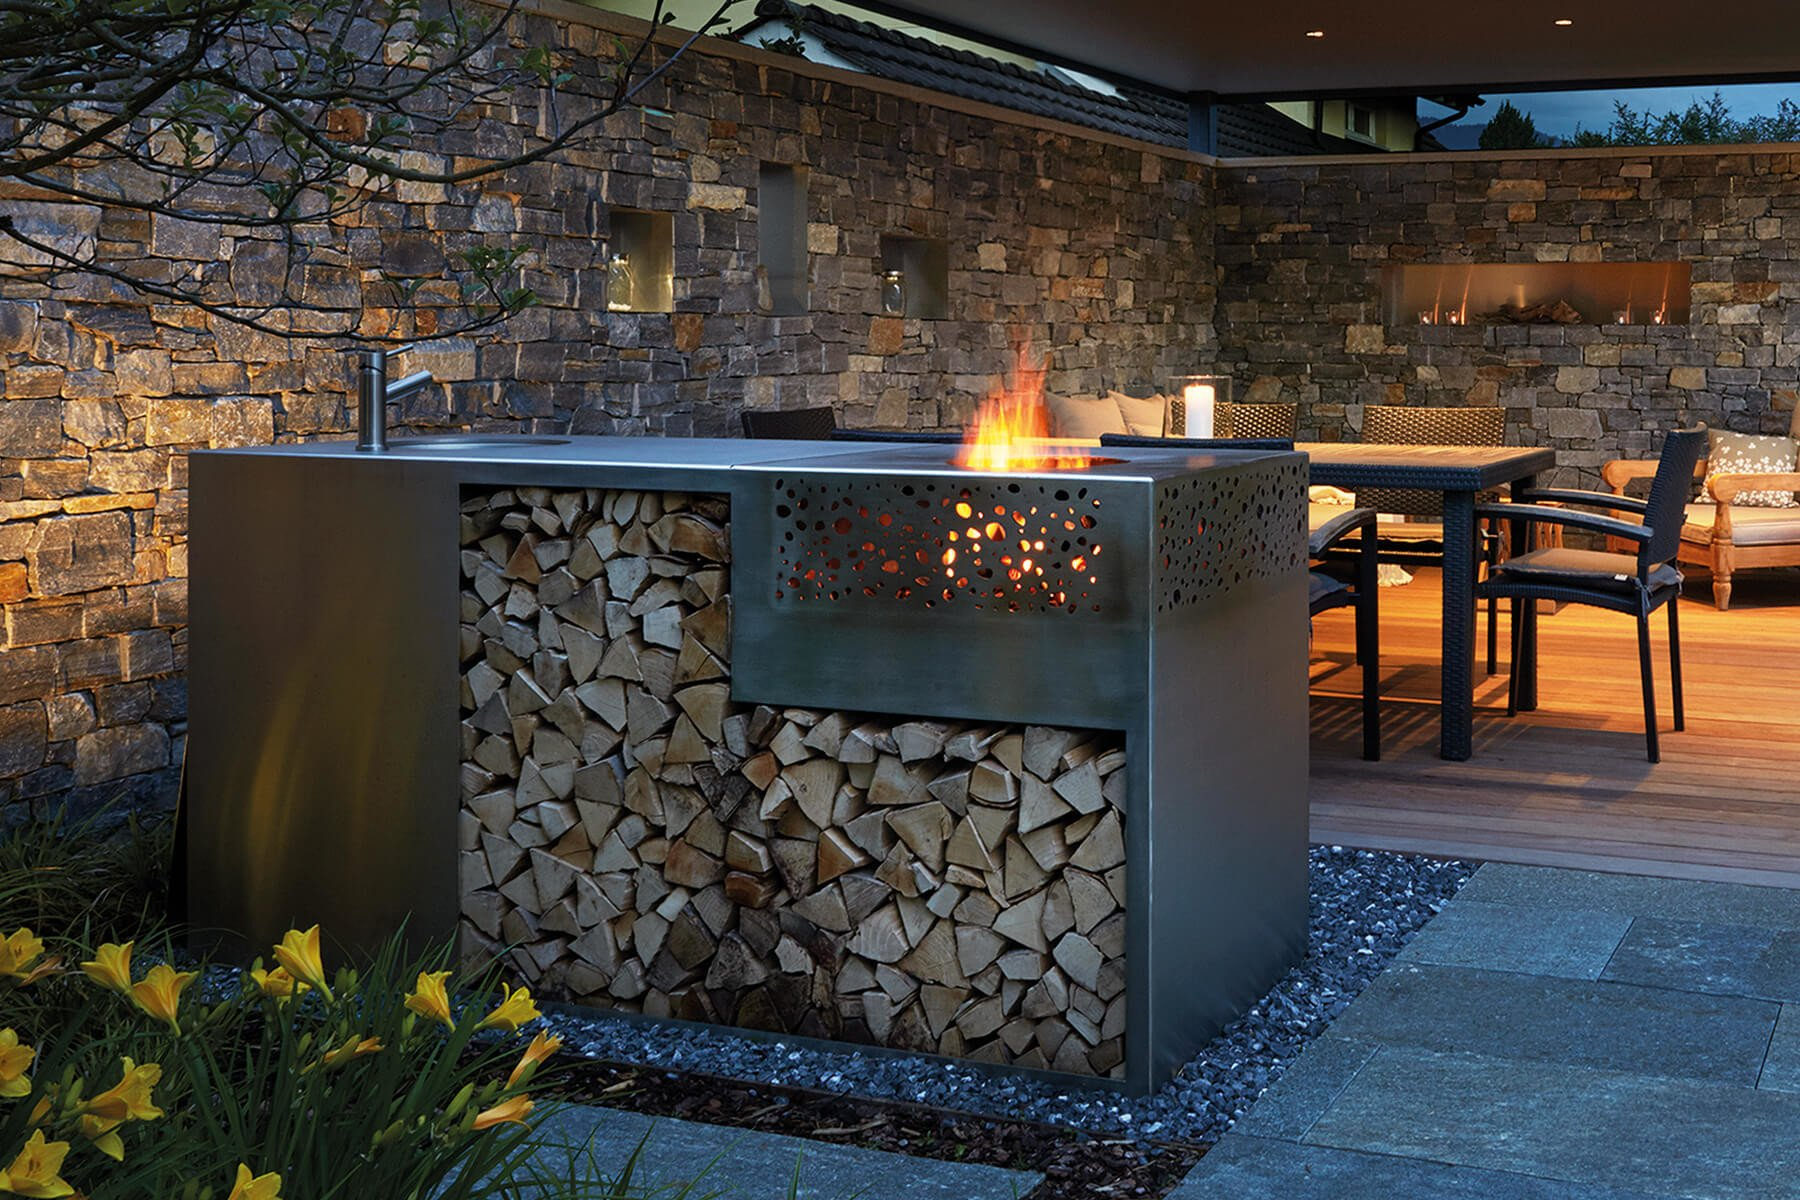 Flammengrill aus Edelstahl beschichtet mit integriertem Holzdepot abends im Garten